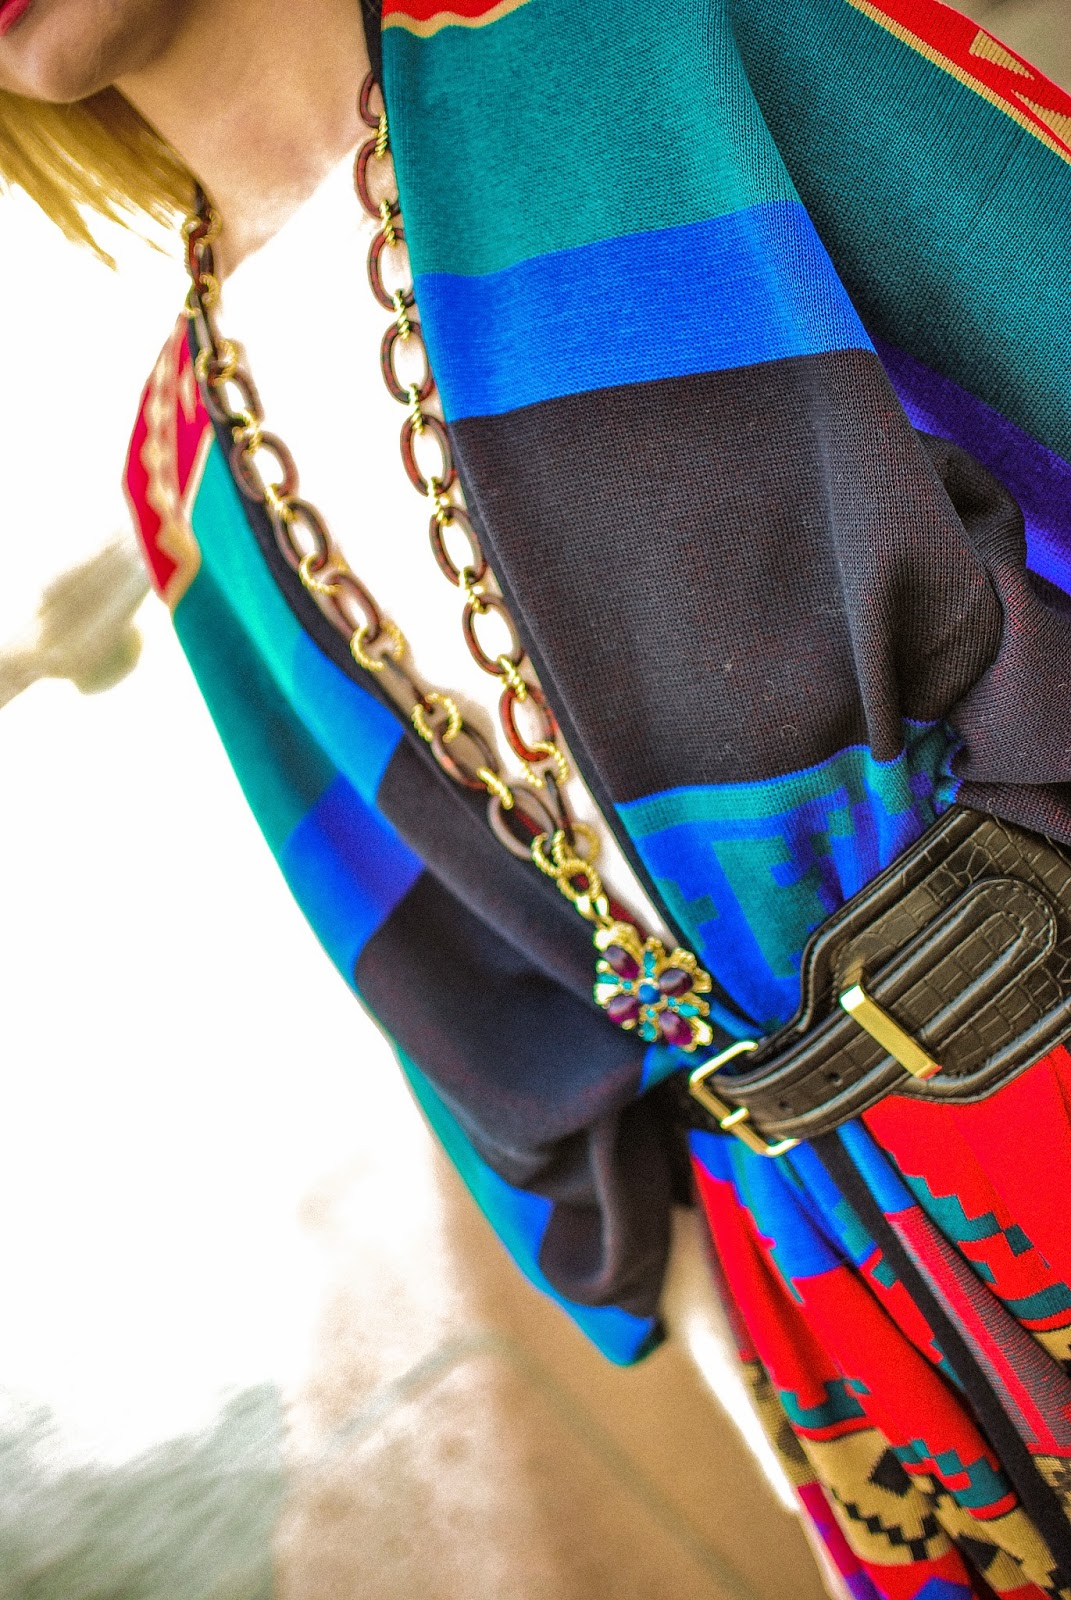 Irina Pavlova blog, blanket coat, накидка плед, осенний лук